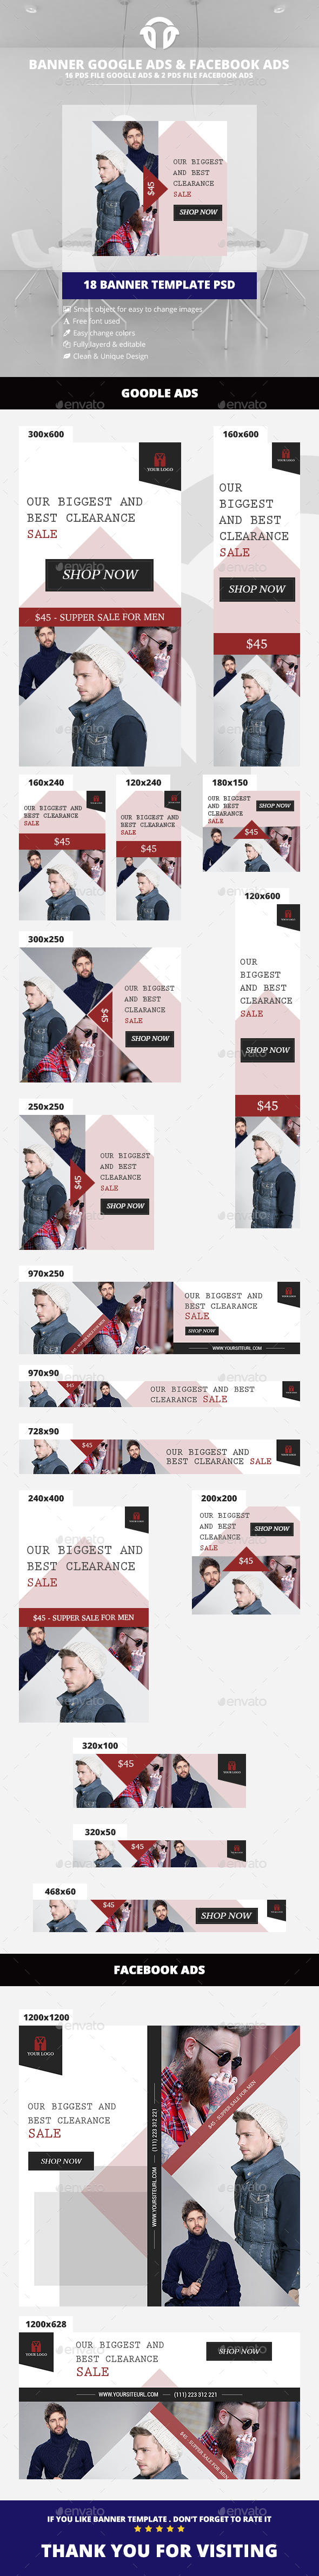 Vintage Fashion Ads - Banners & Ads Web Elements